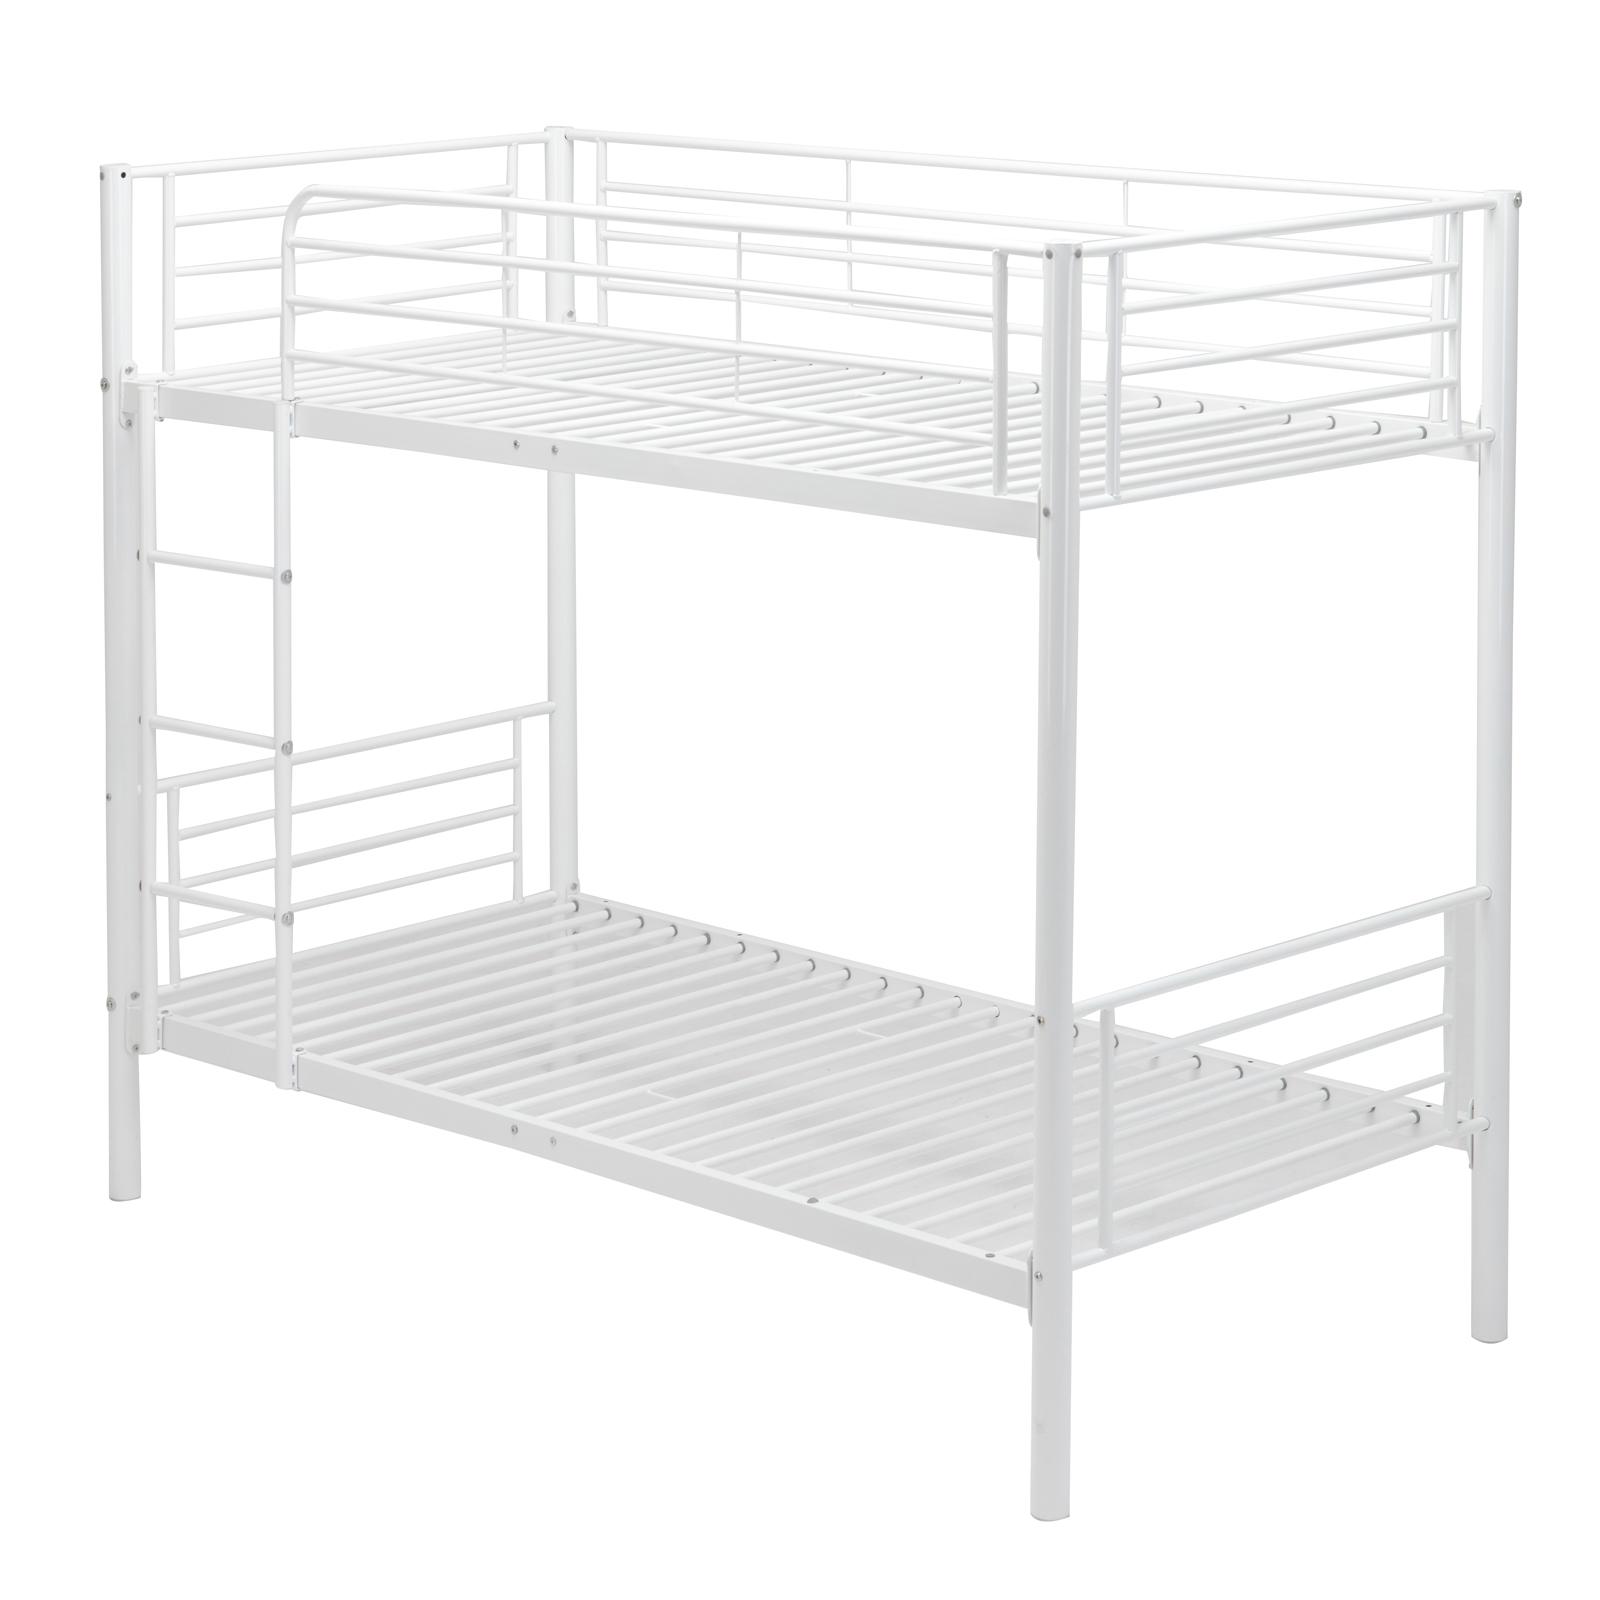 Metal Bunk Beds Frame Twin over Twin Ladder Bedroom Dorm for Kids